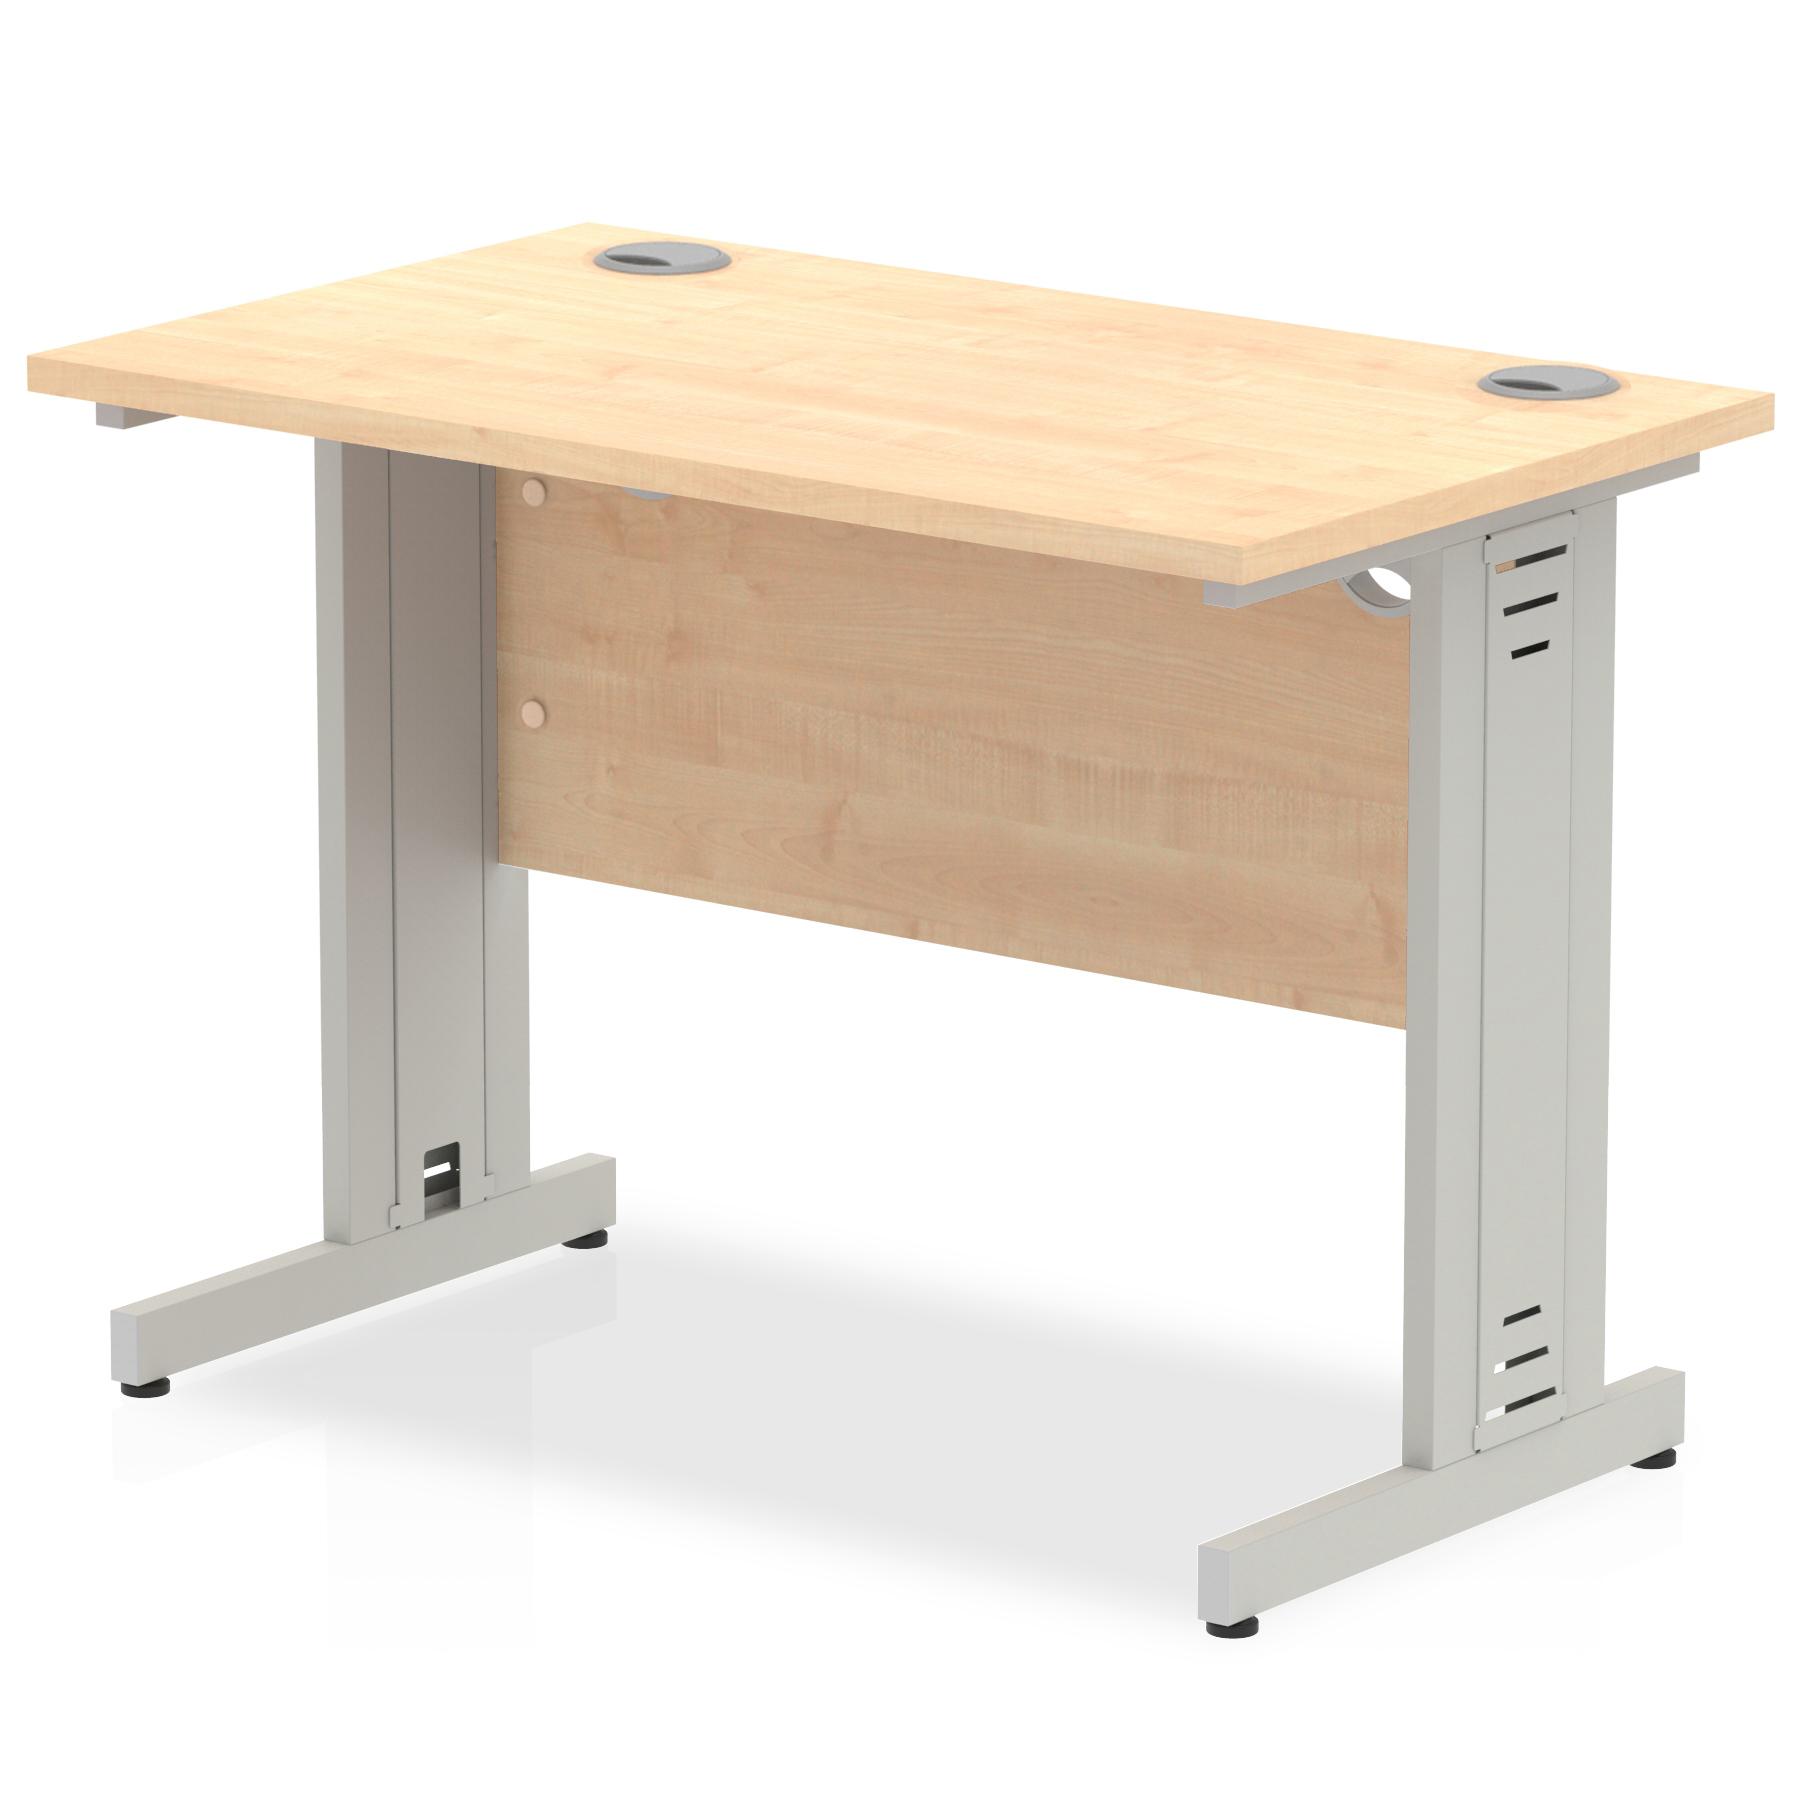 Trexus Desk Rectangle Cable Managed Silver Leg 1000x600mm Maple Ref MI002501